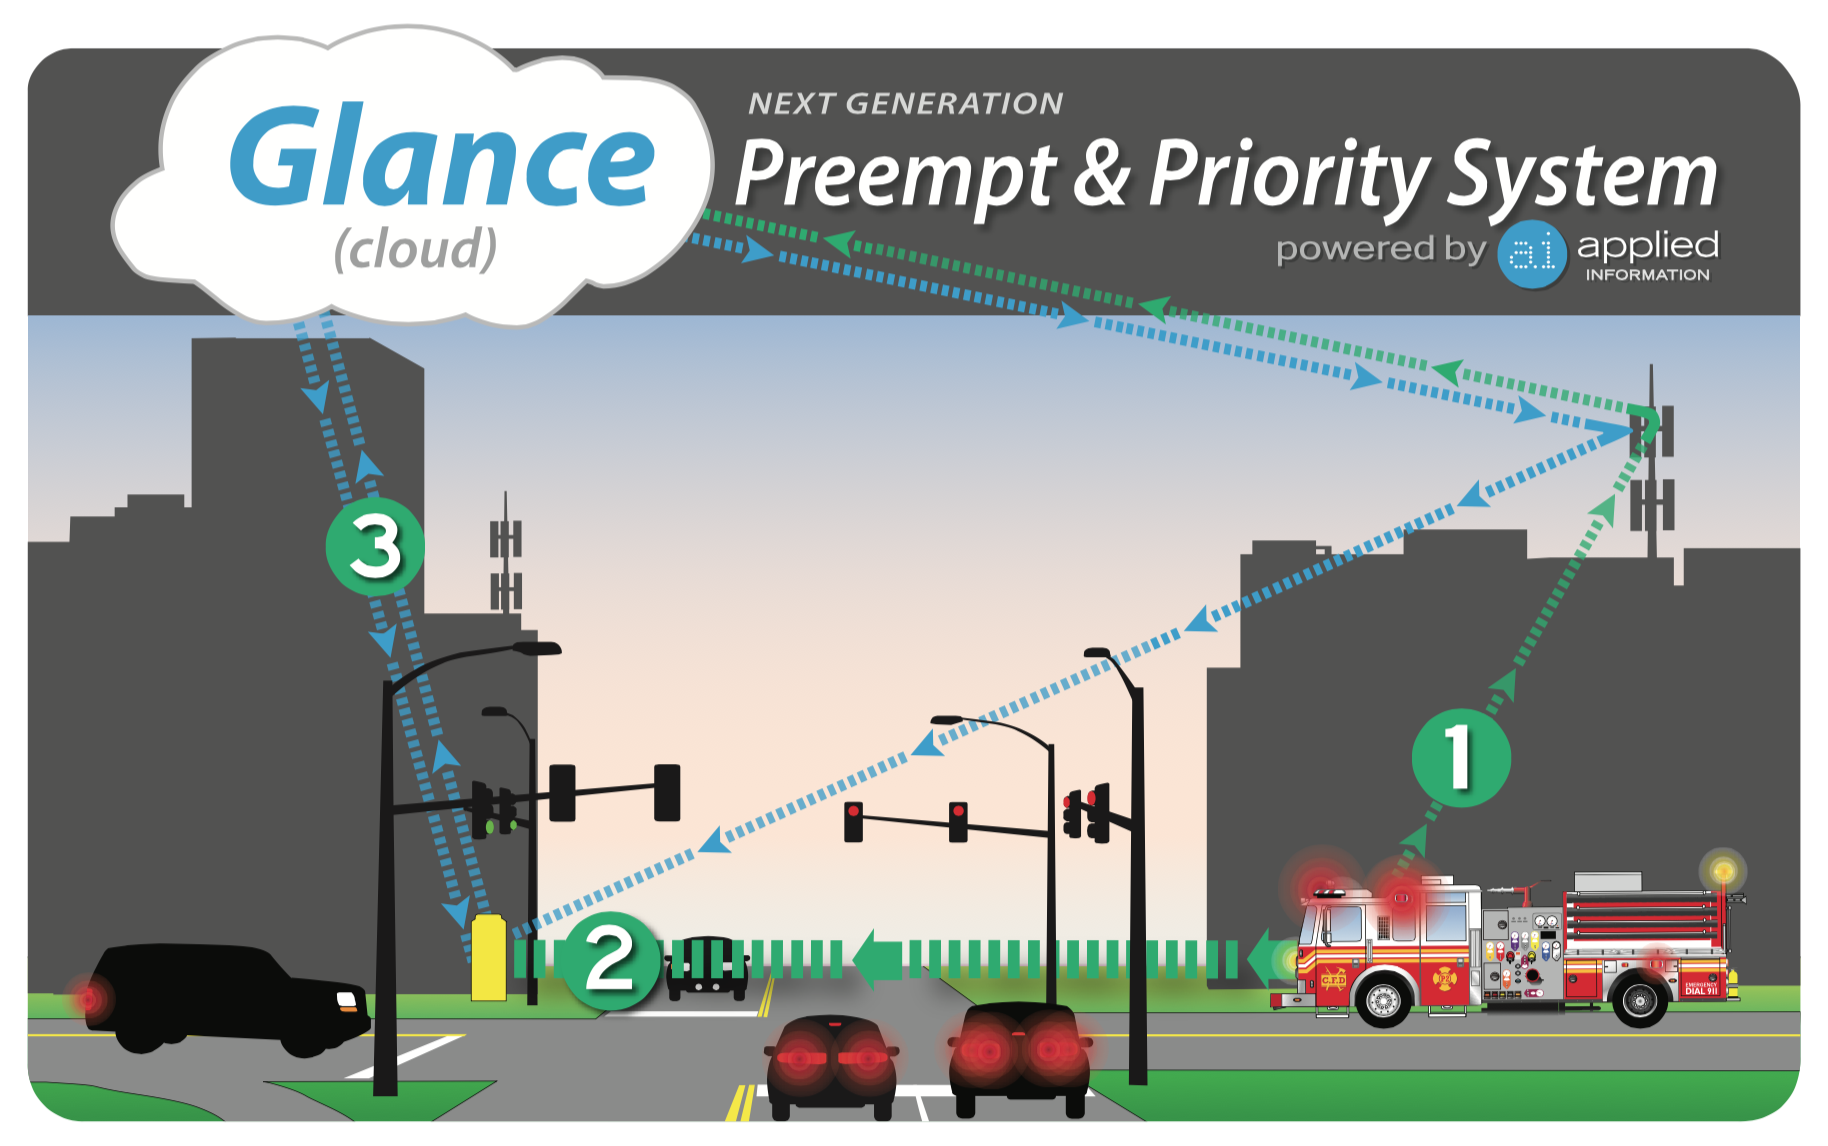 Glance Preempt & Priority System